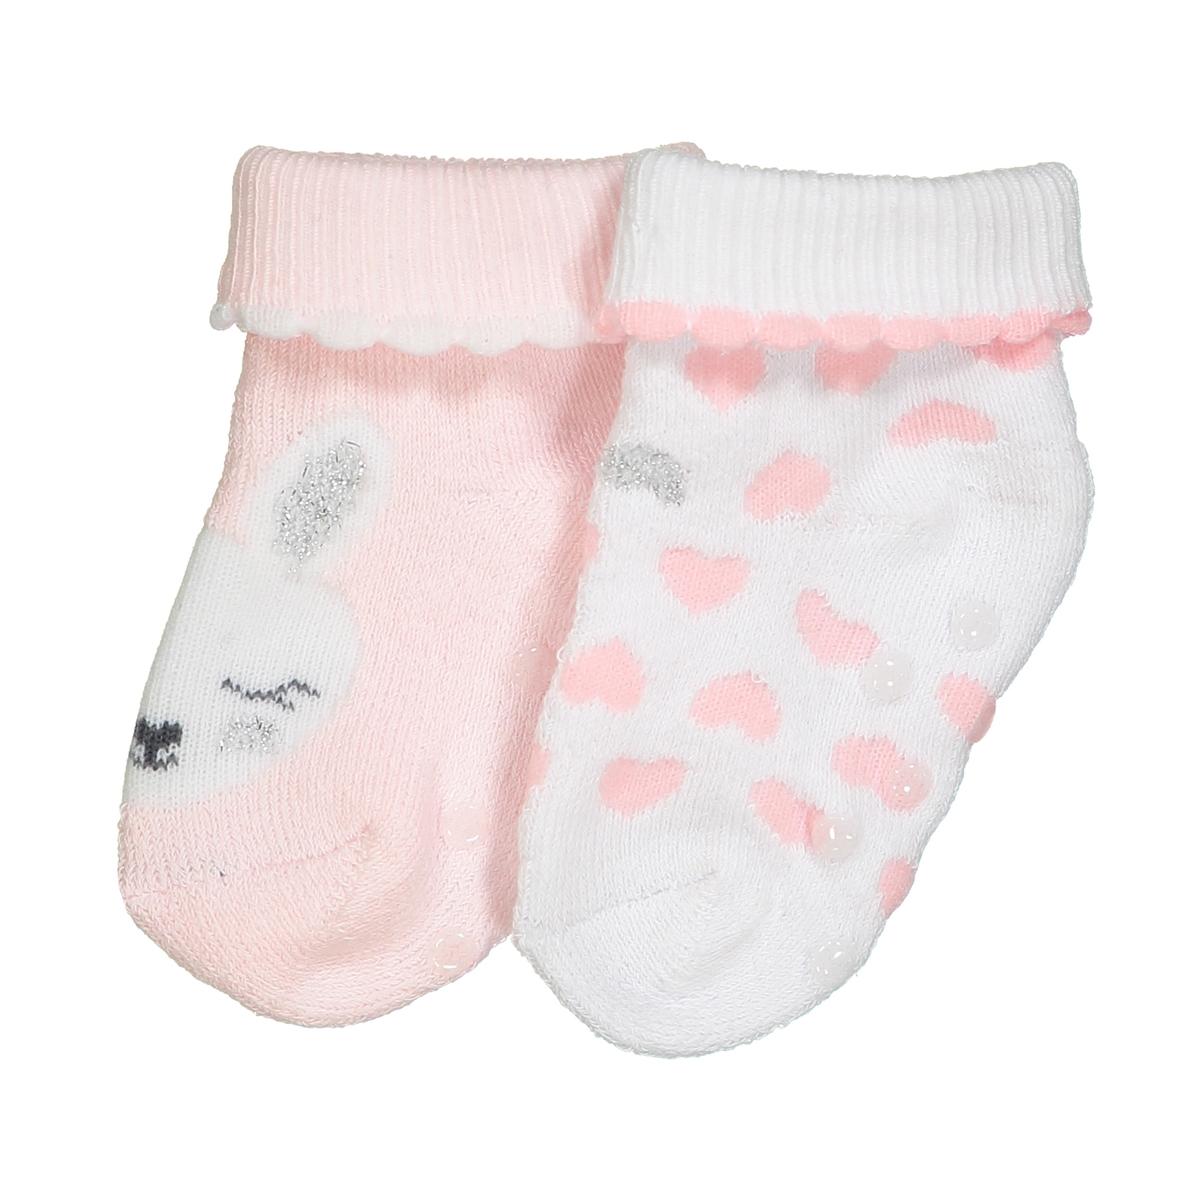 Носки с рисунком, букле, комплект из 2 пар